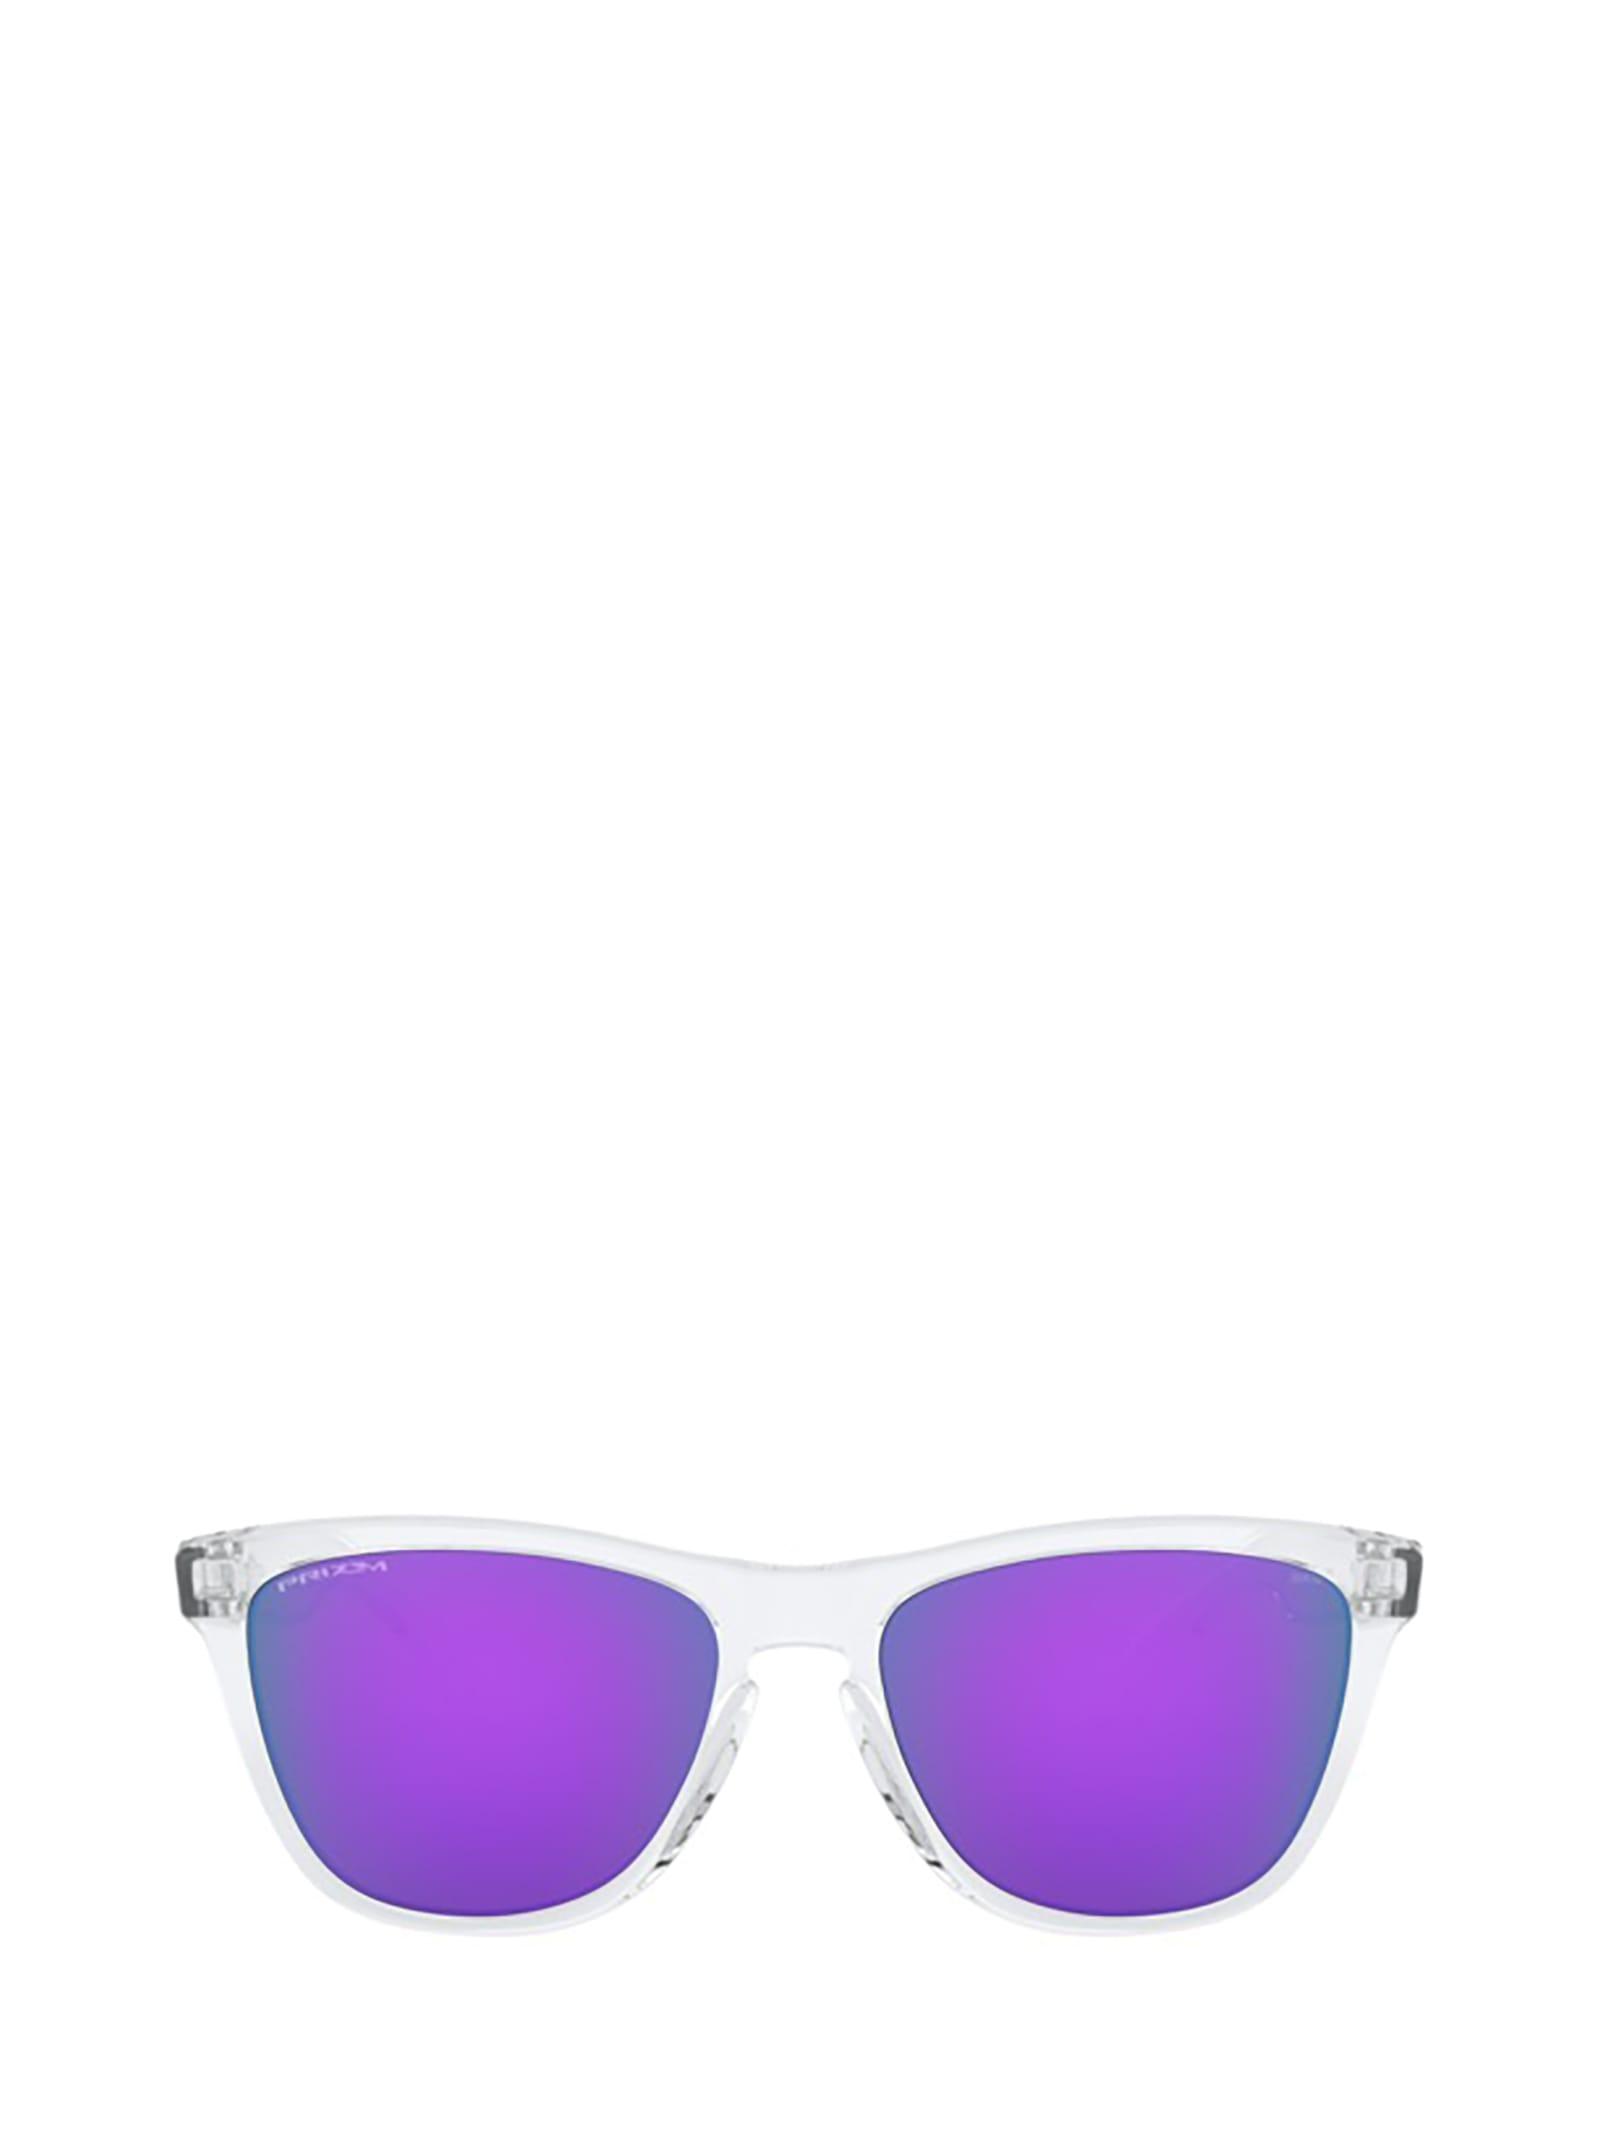 Oakley Oj9006 Polished Clear Sunglasses